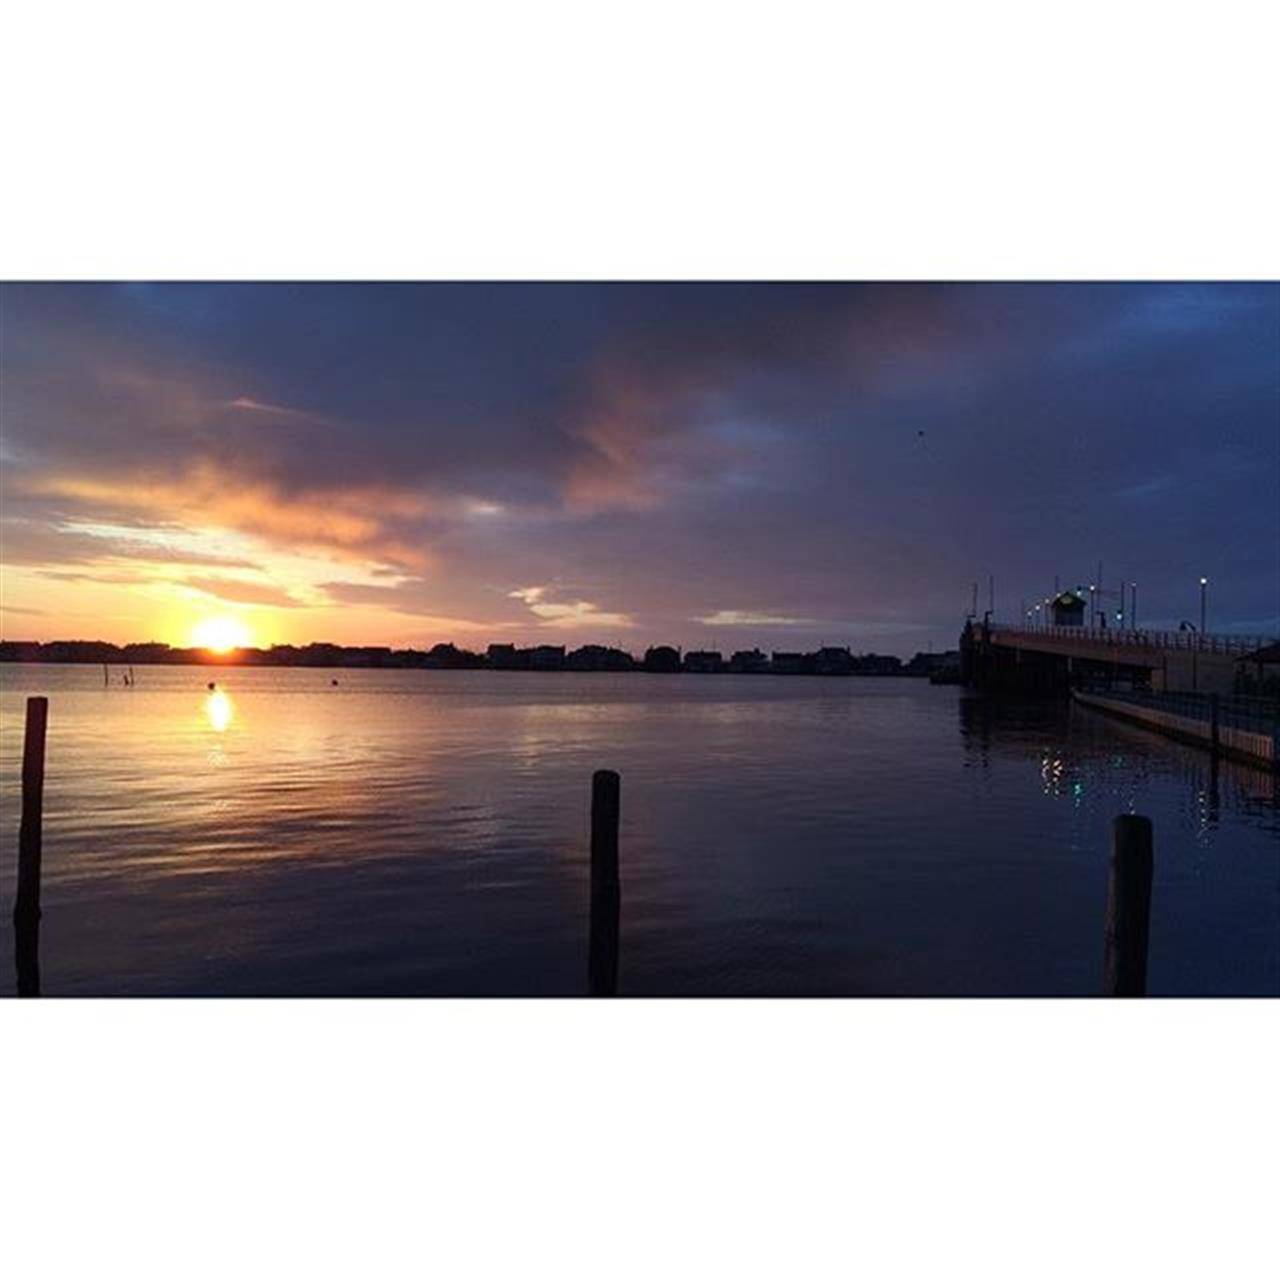 Good morning!  #goodmorning #nj #sunrise #jshn